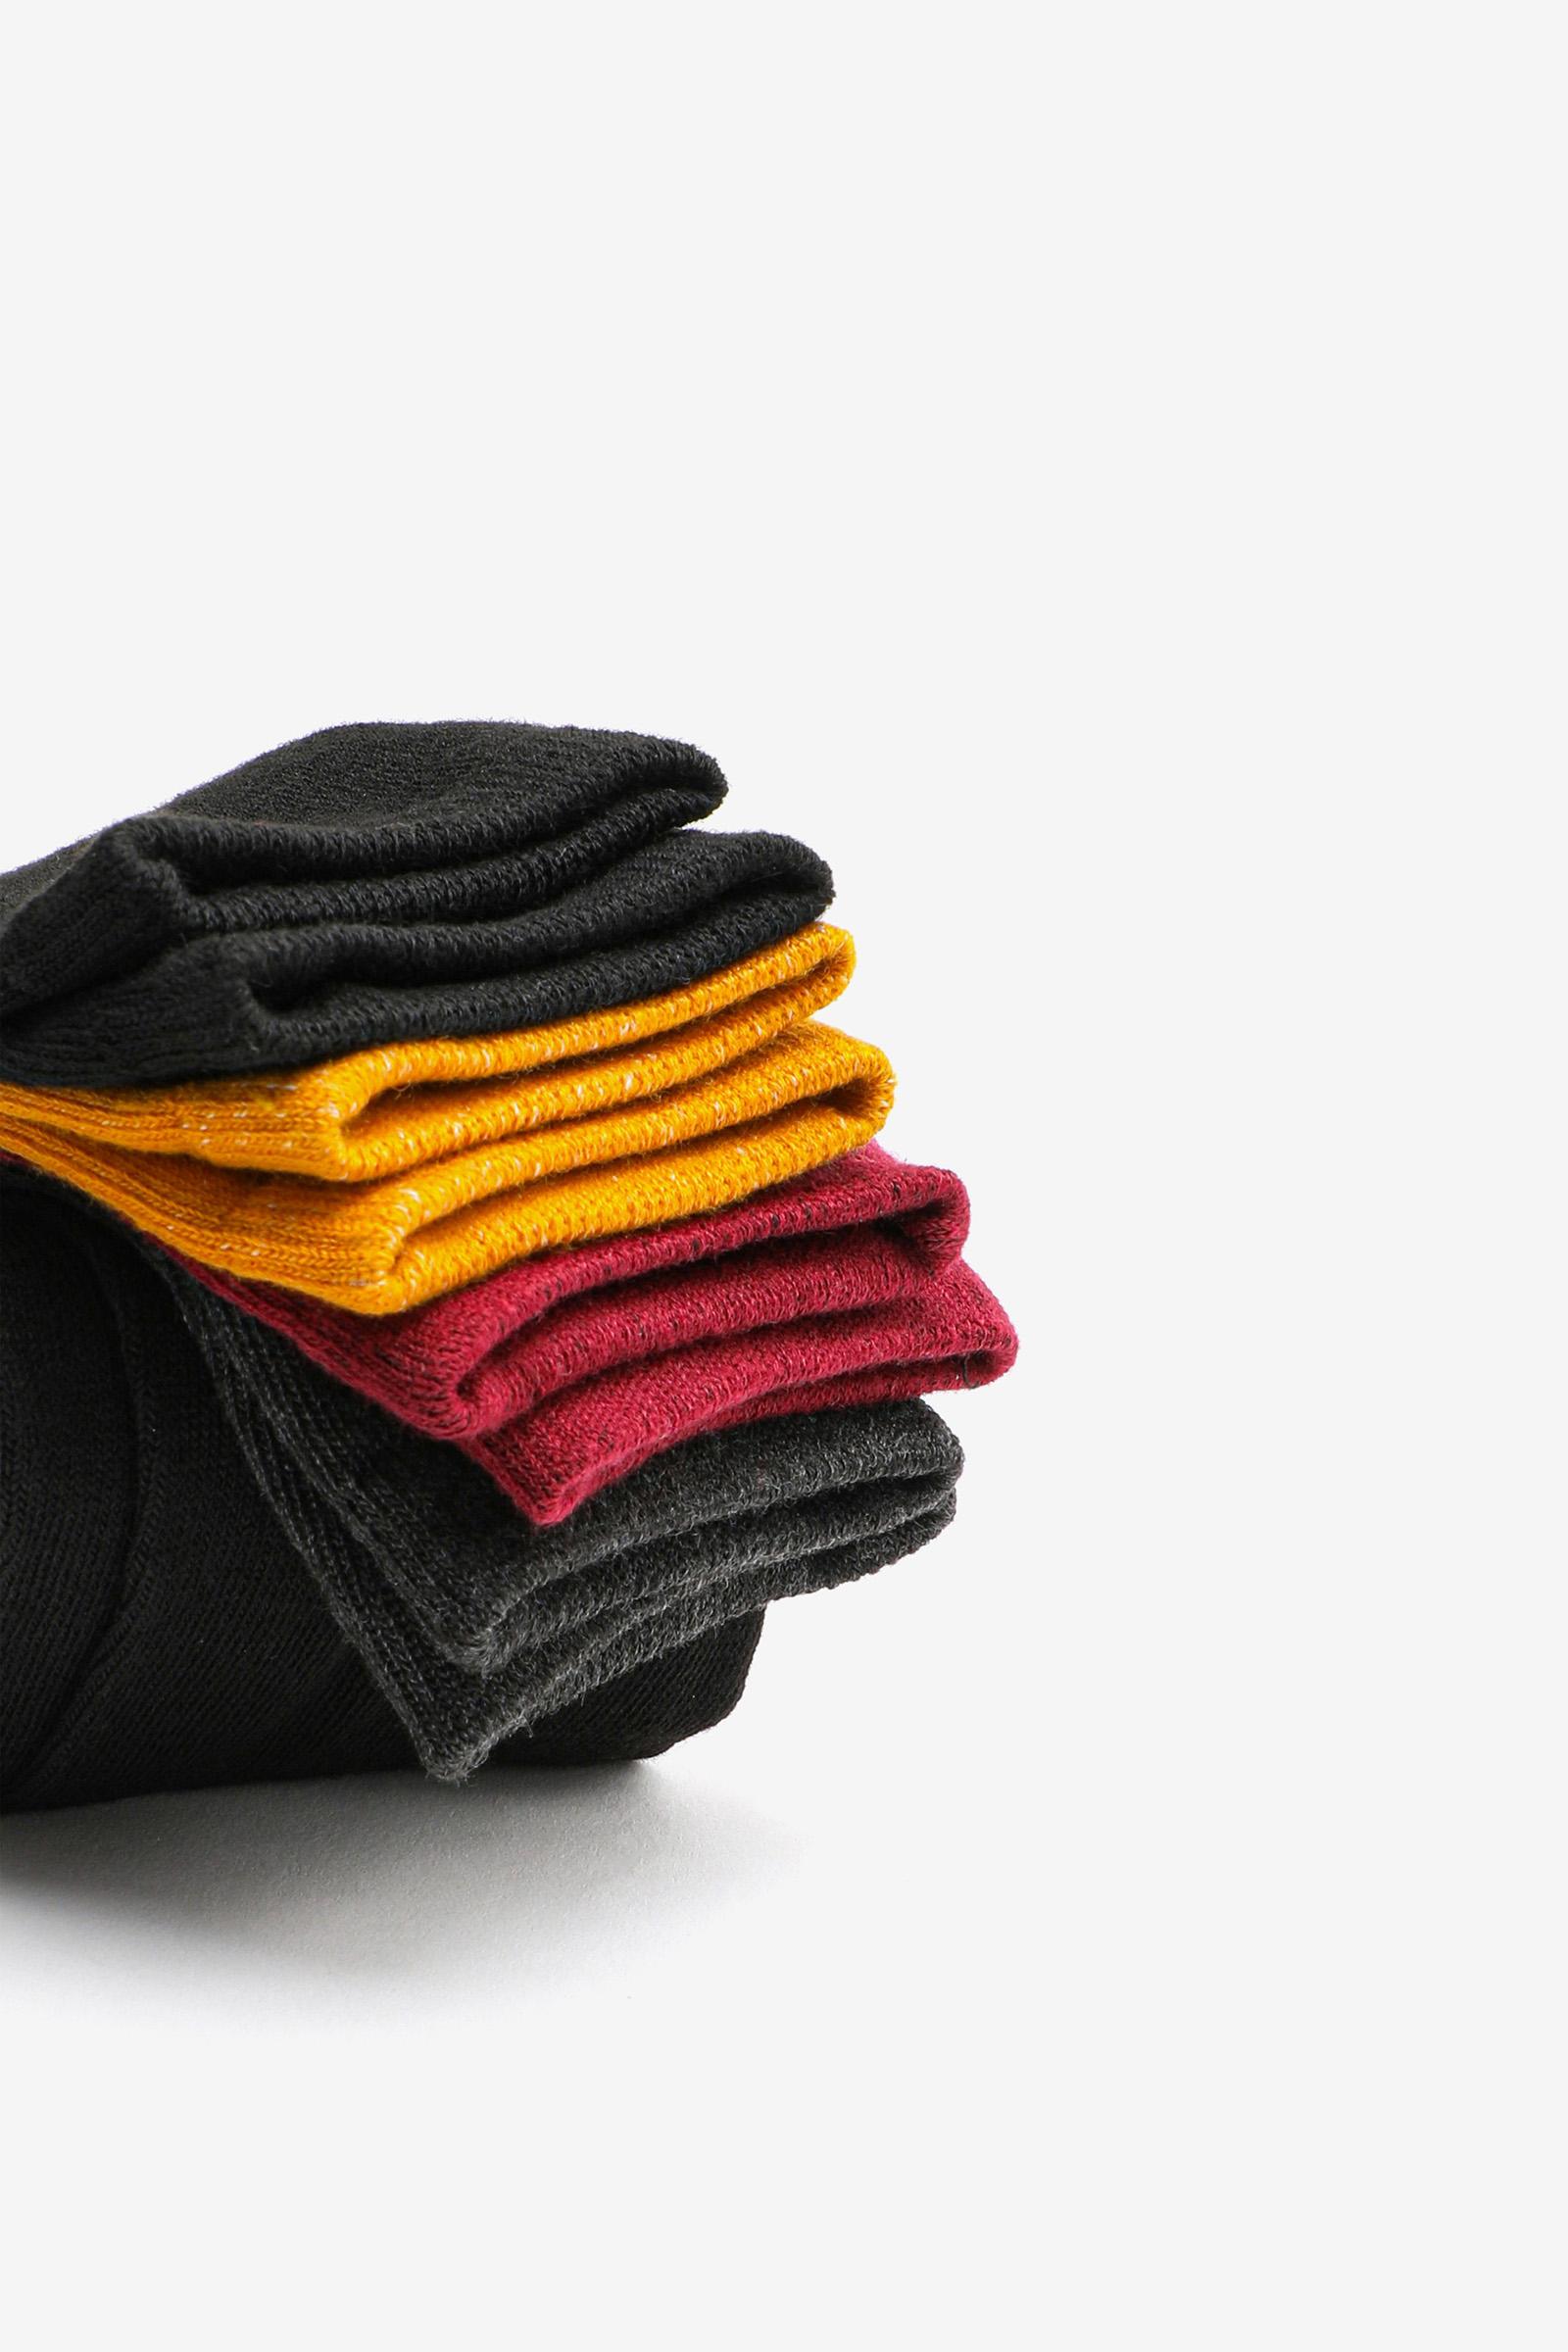 Pack of Matching Crew Socks